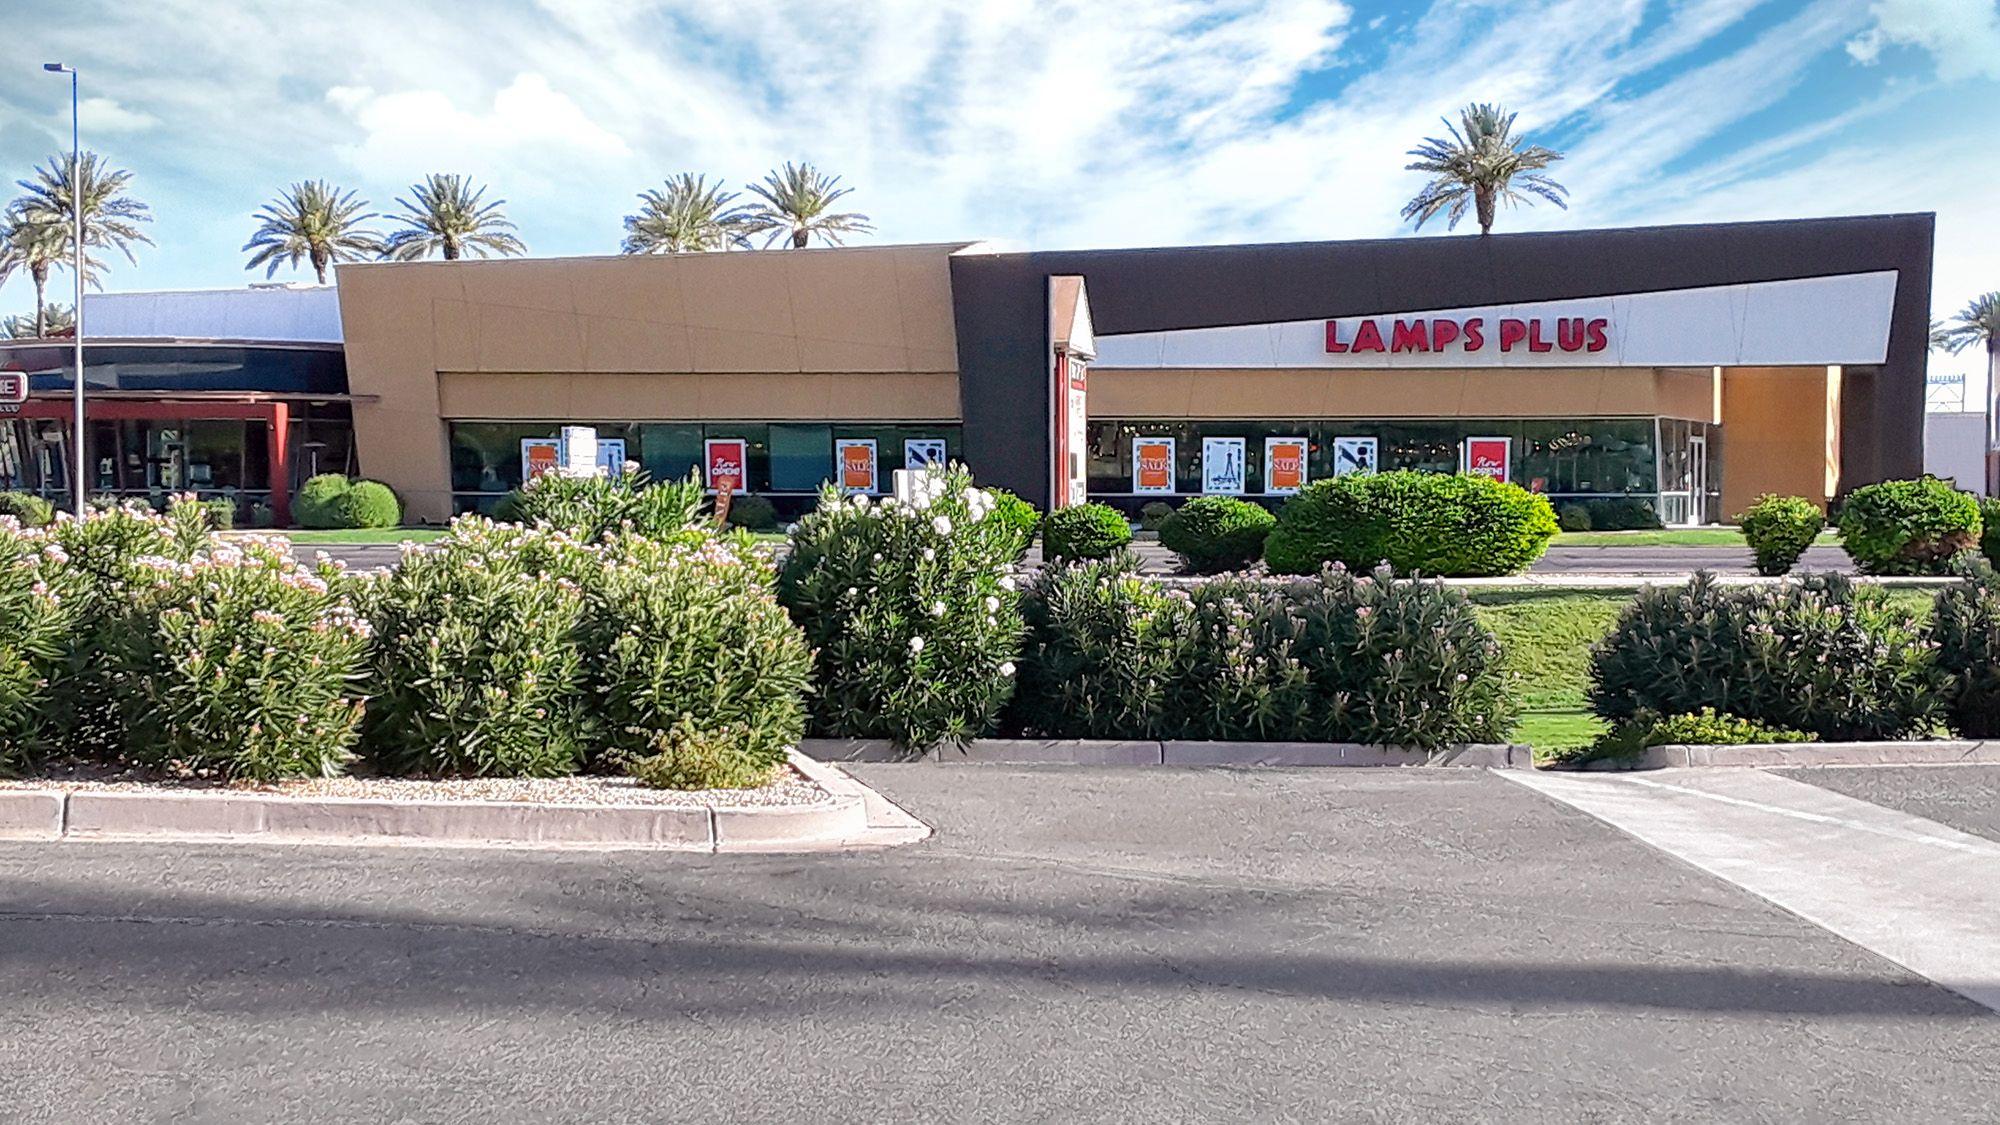 Amazing Lamps Plus Scottsdale AZ #38